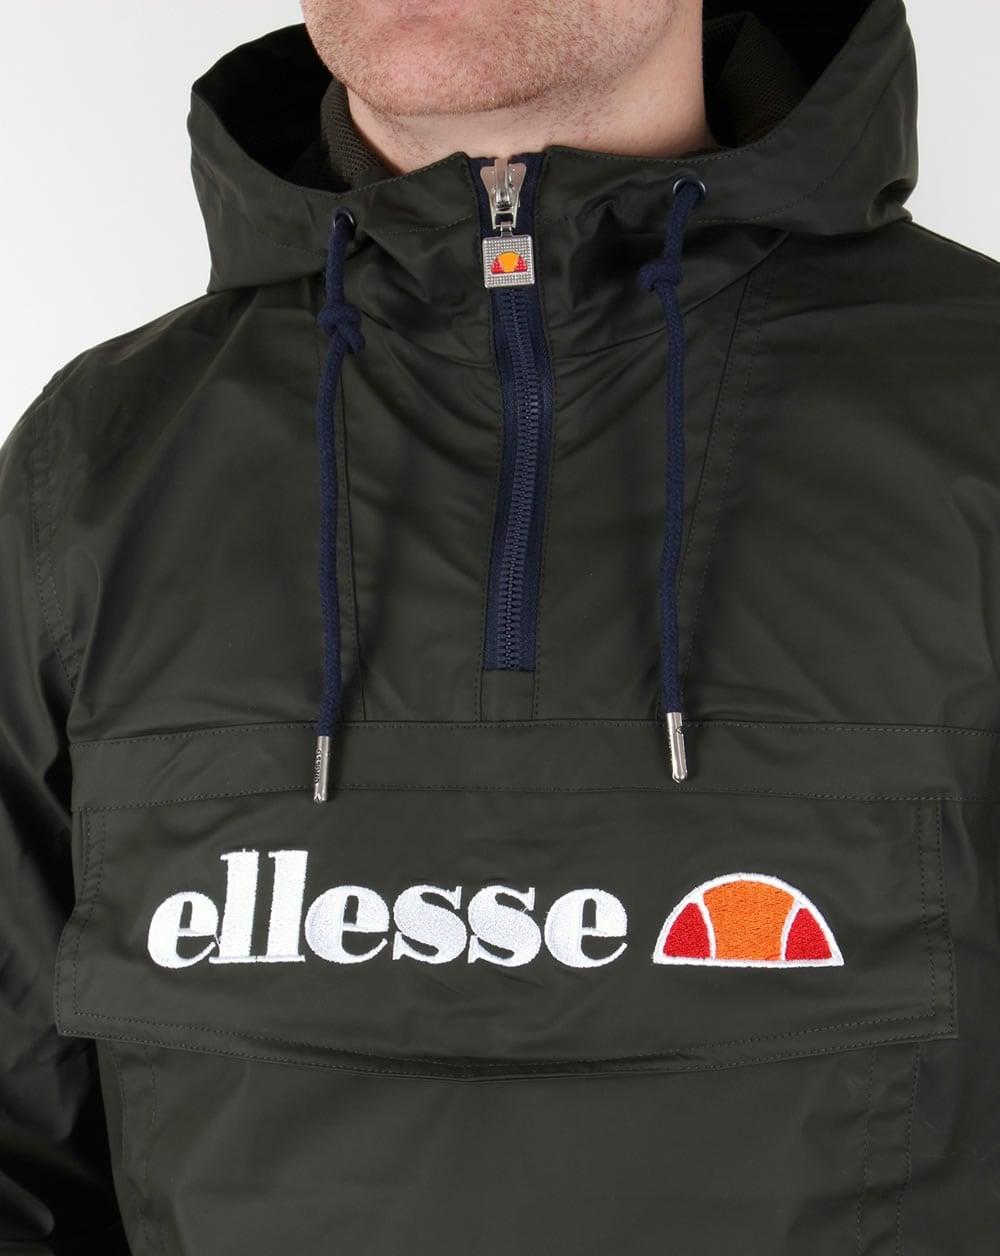 20c1c333f1 Ellesse Mont Brava Quarter Zip Jacket Rosin Green,smock,coat ...